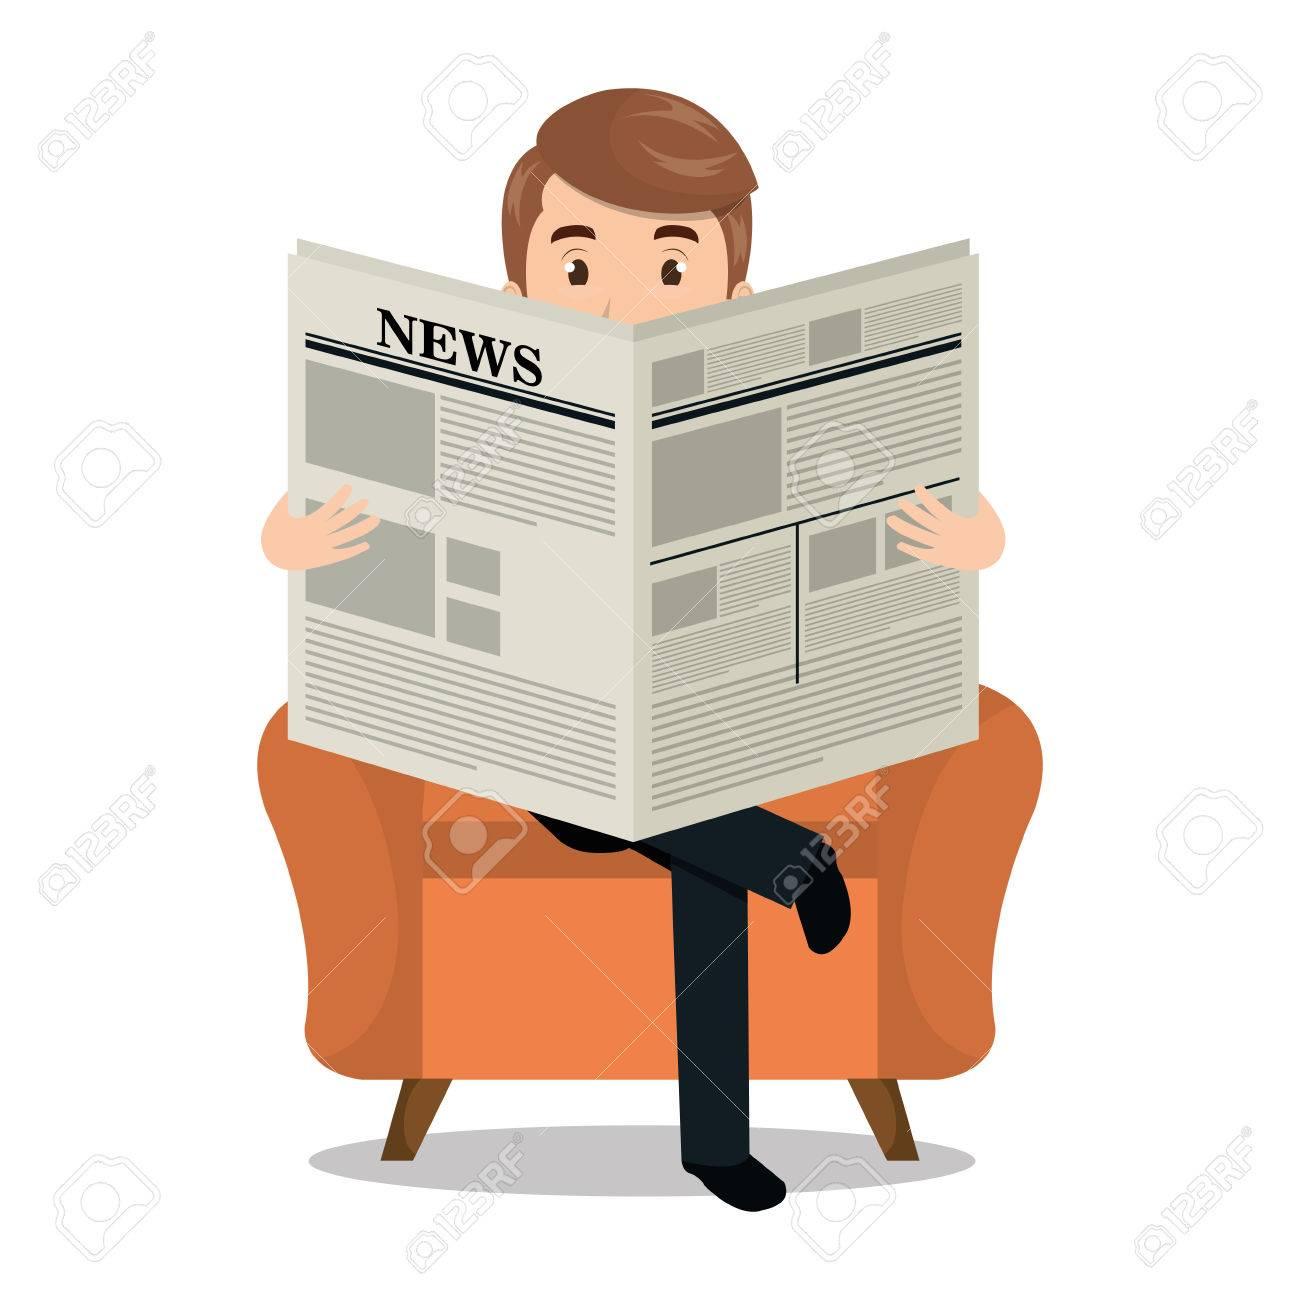 man reading newspaper icon vector illustration design royalty free